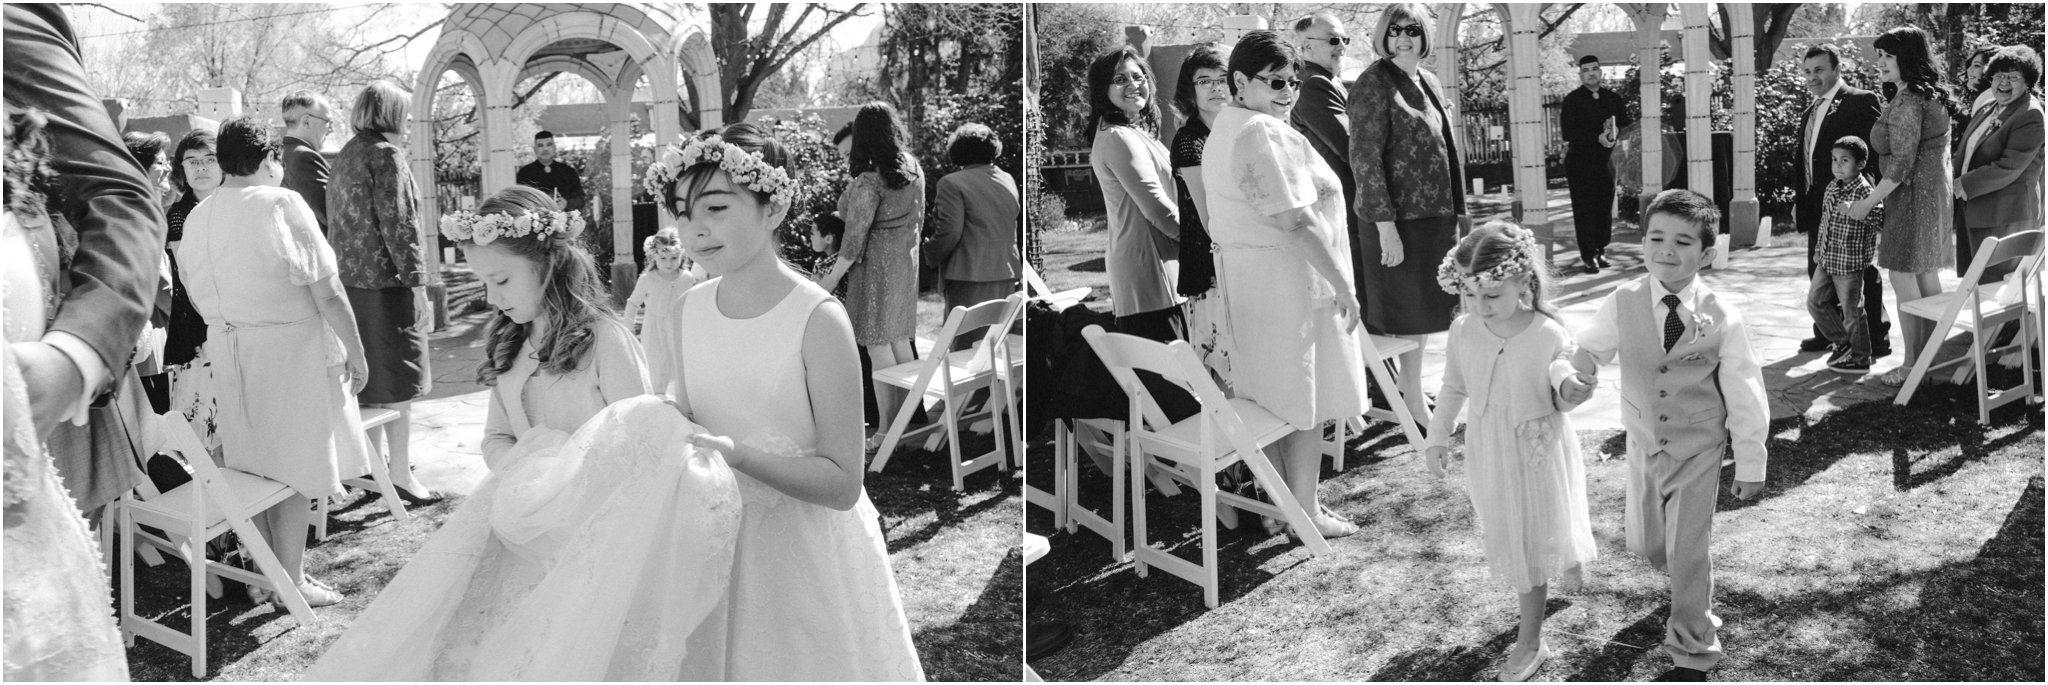 0023albuquerque-wedding-photographer_santa-fe-wedding-photographer_-southwest-wedding-photography_-blue-rose-studio